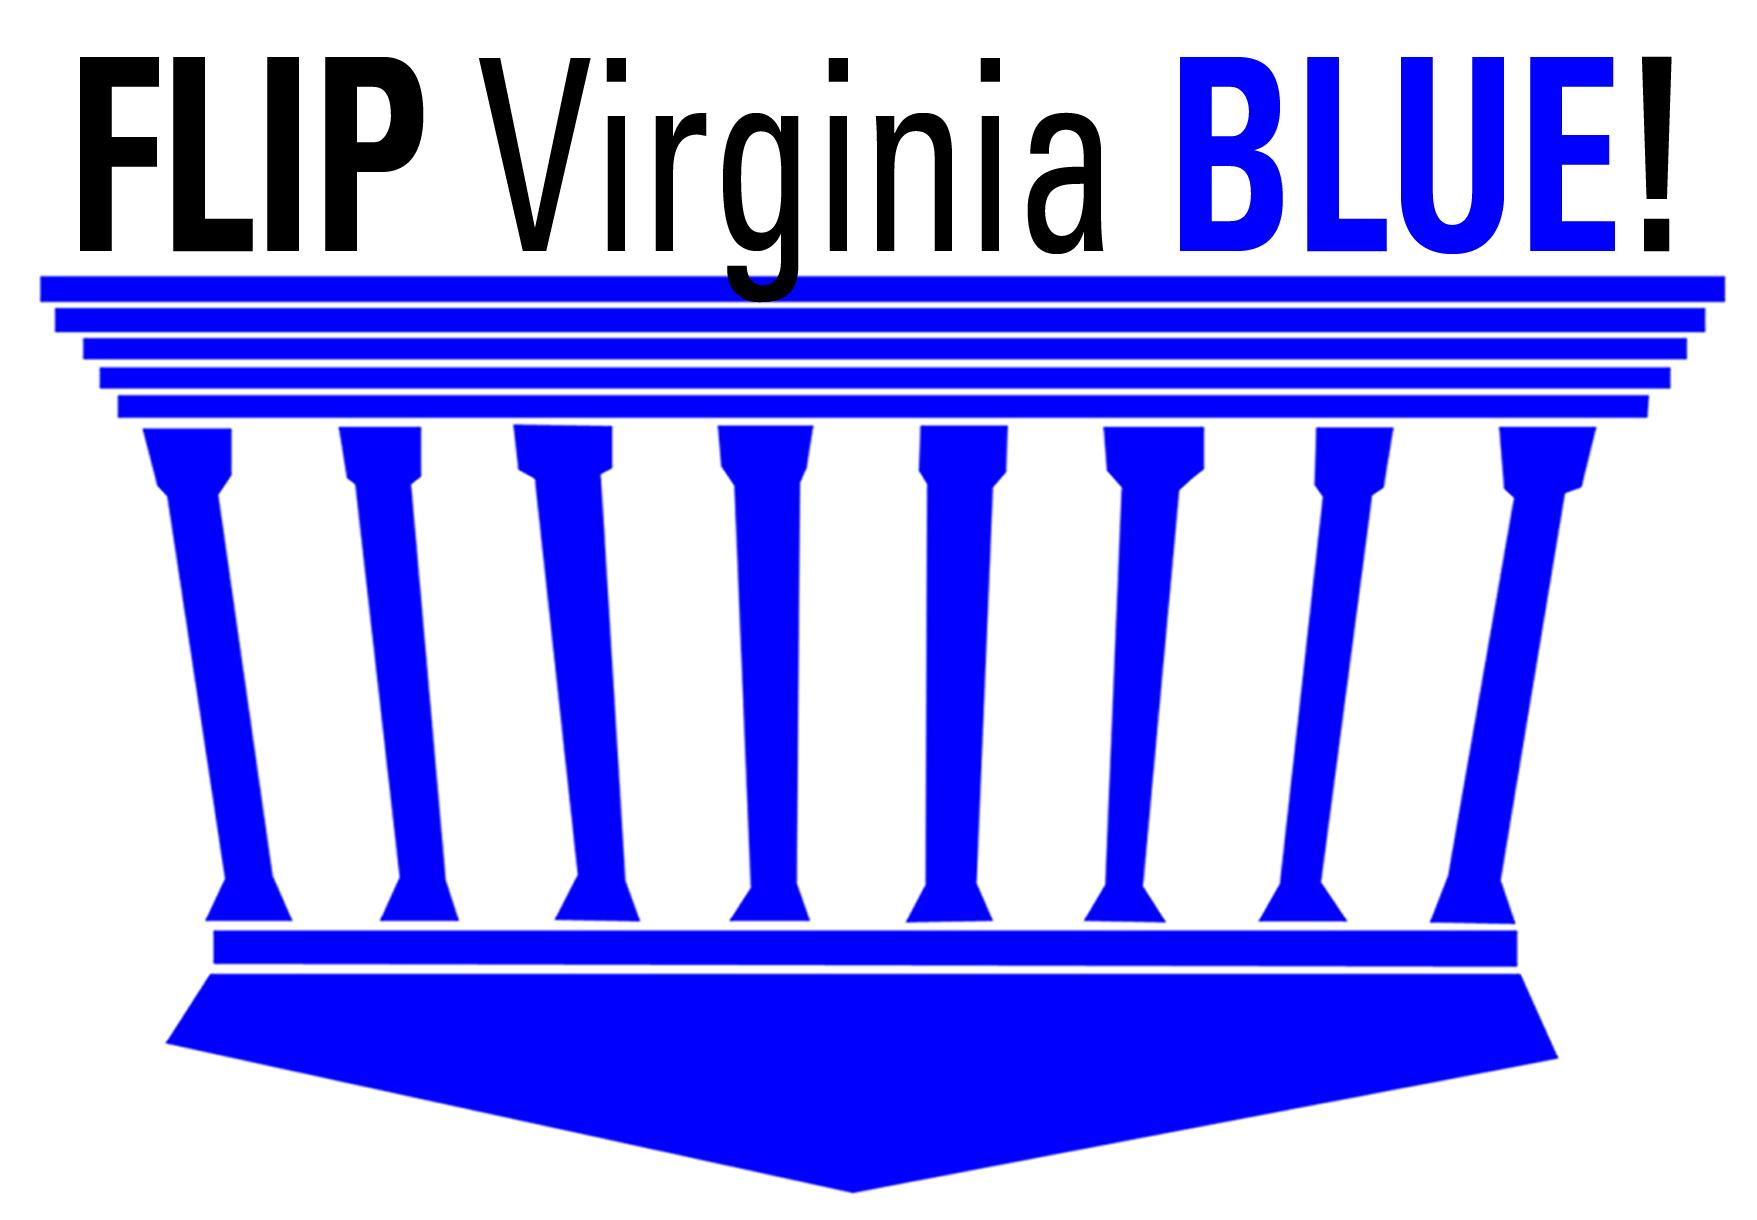 Virginia_poster_2019_1757_x_1220